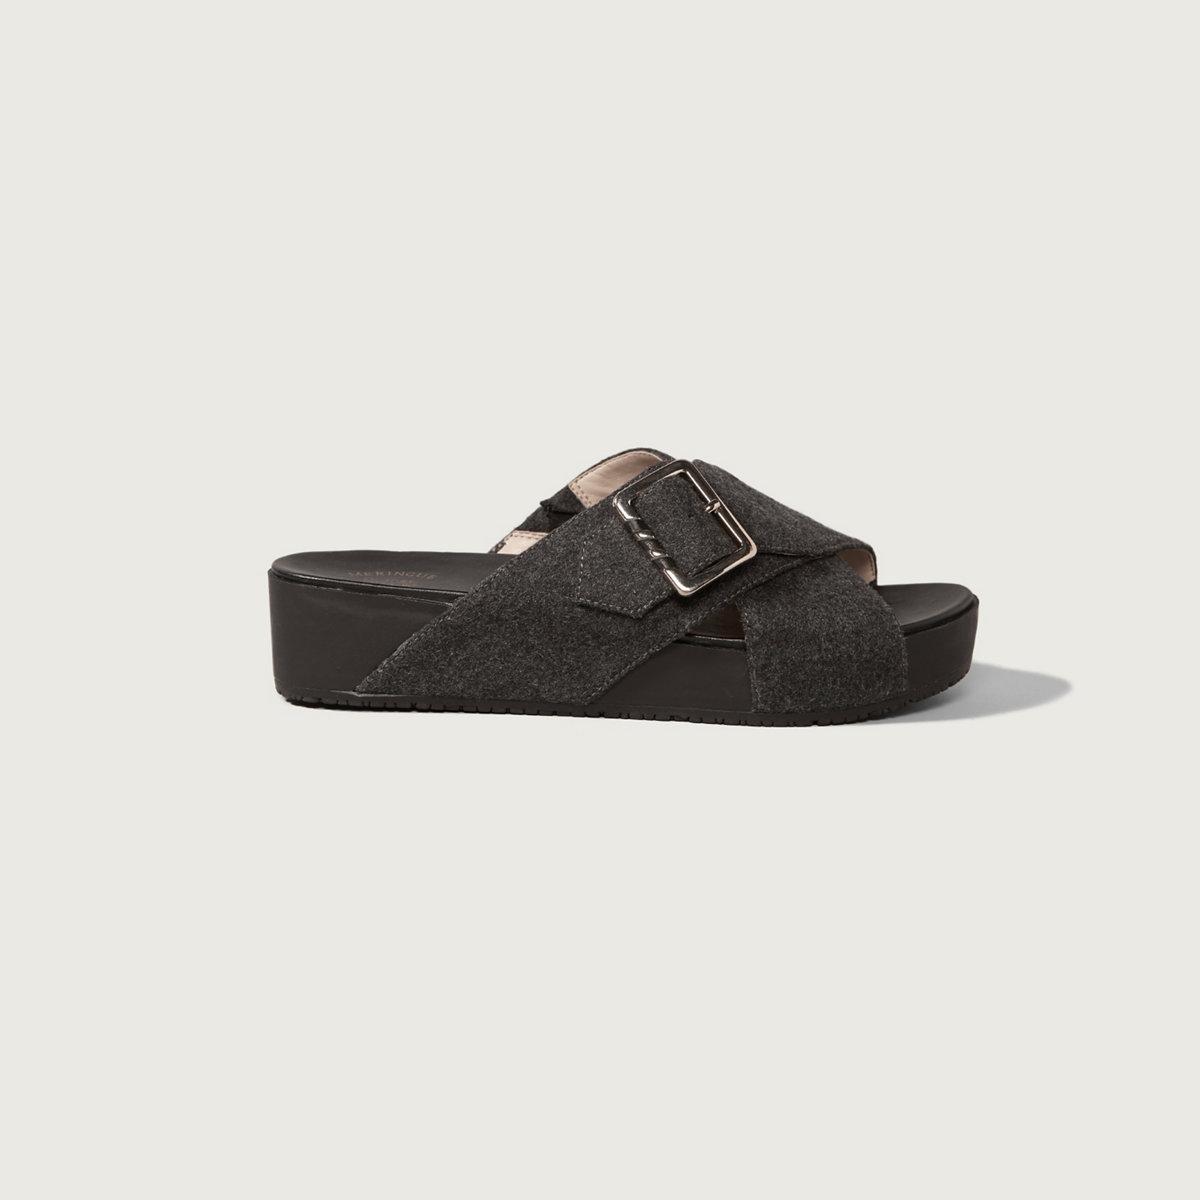 Dr. Scholl's Flight Sandals